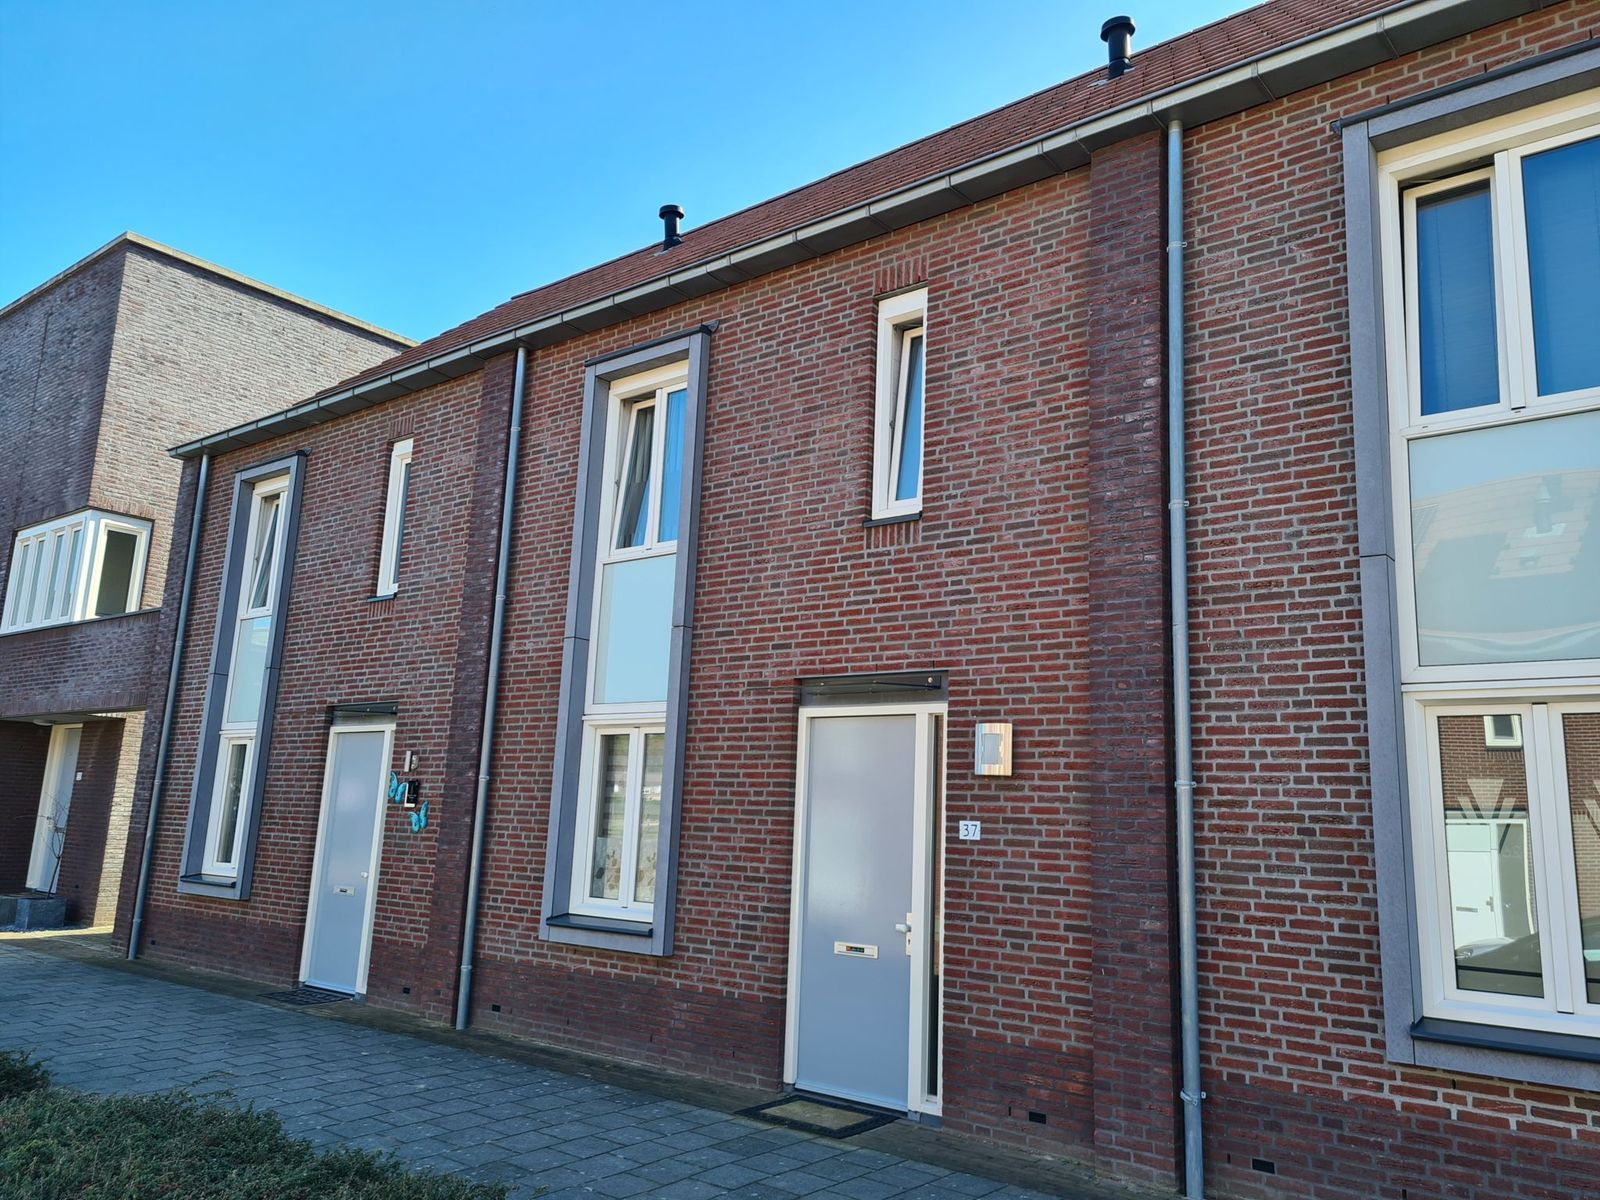 Dr. Poelsstraat, Landgraaf